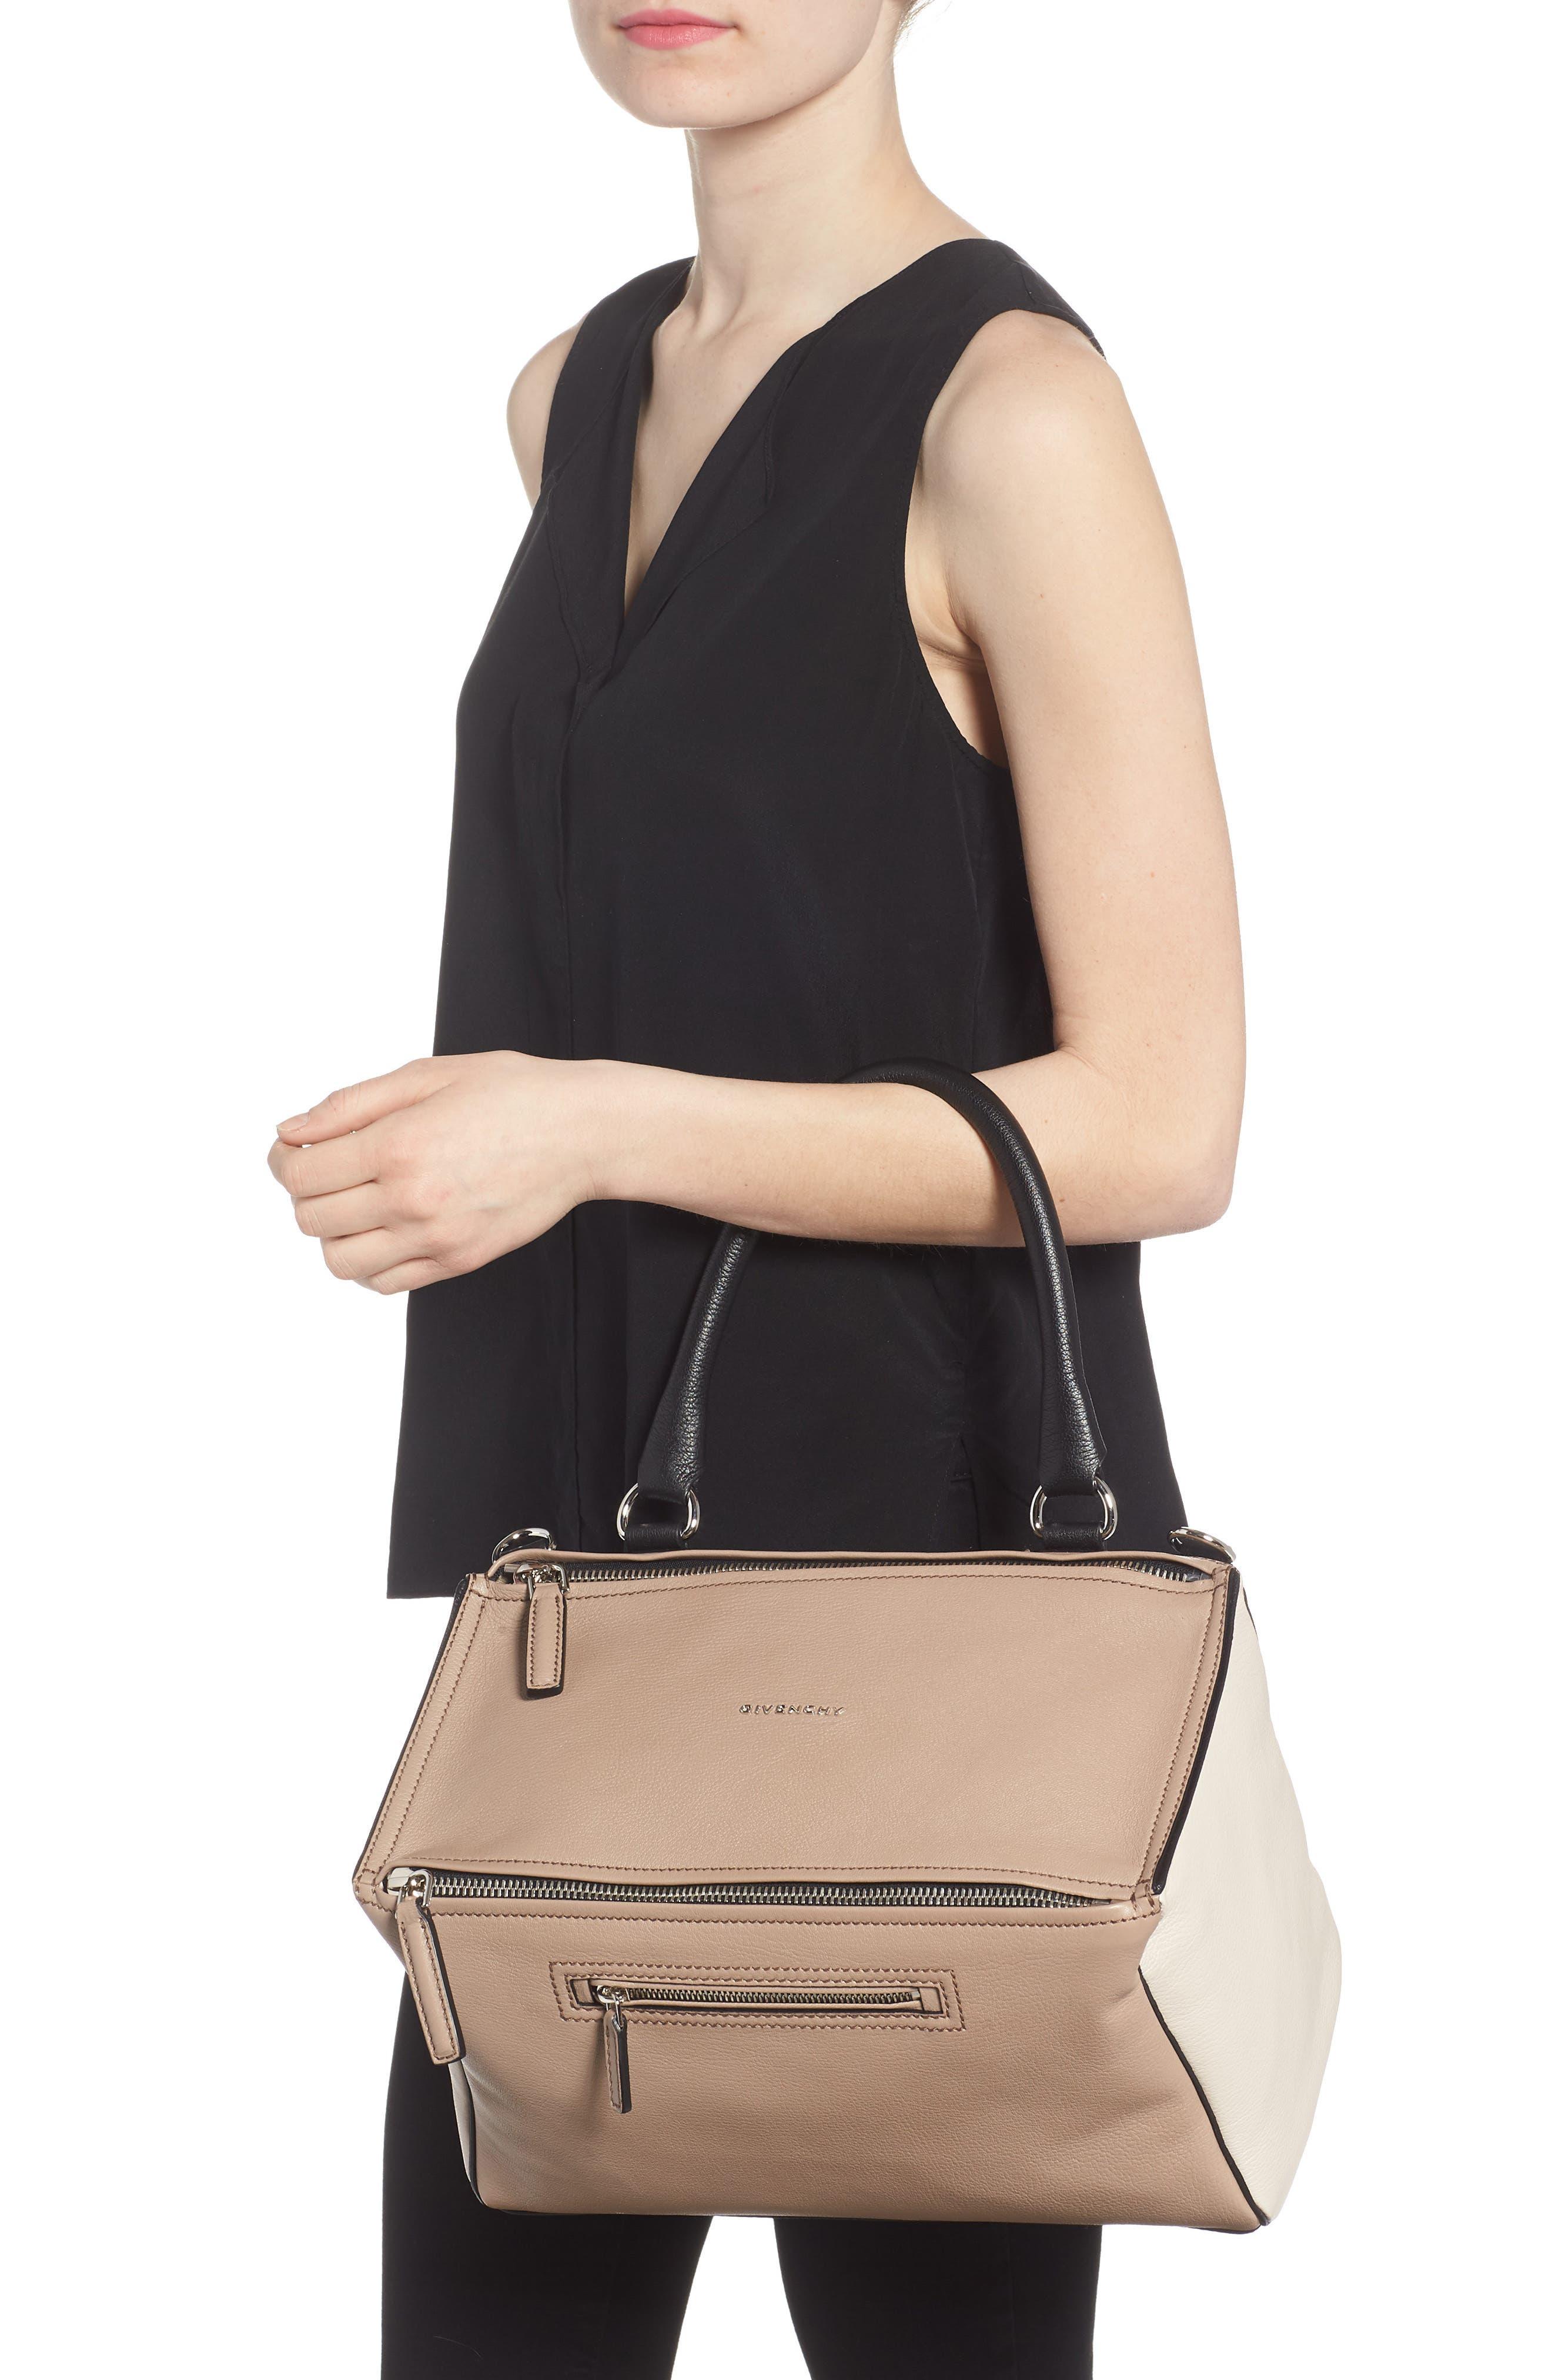 Medium Pandora Box Tricolor Leather Crossbody Bag,                             Alternate thumbnail 2, color,                             250